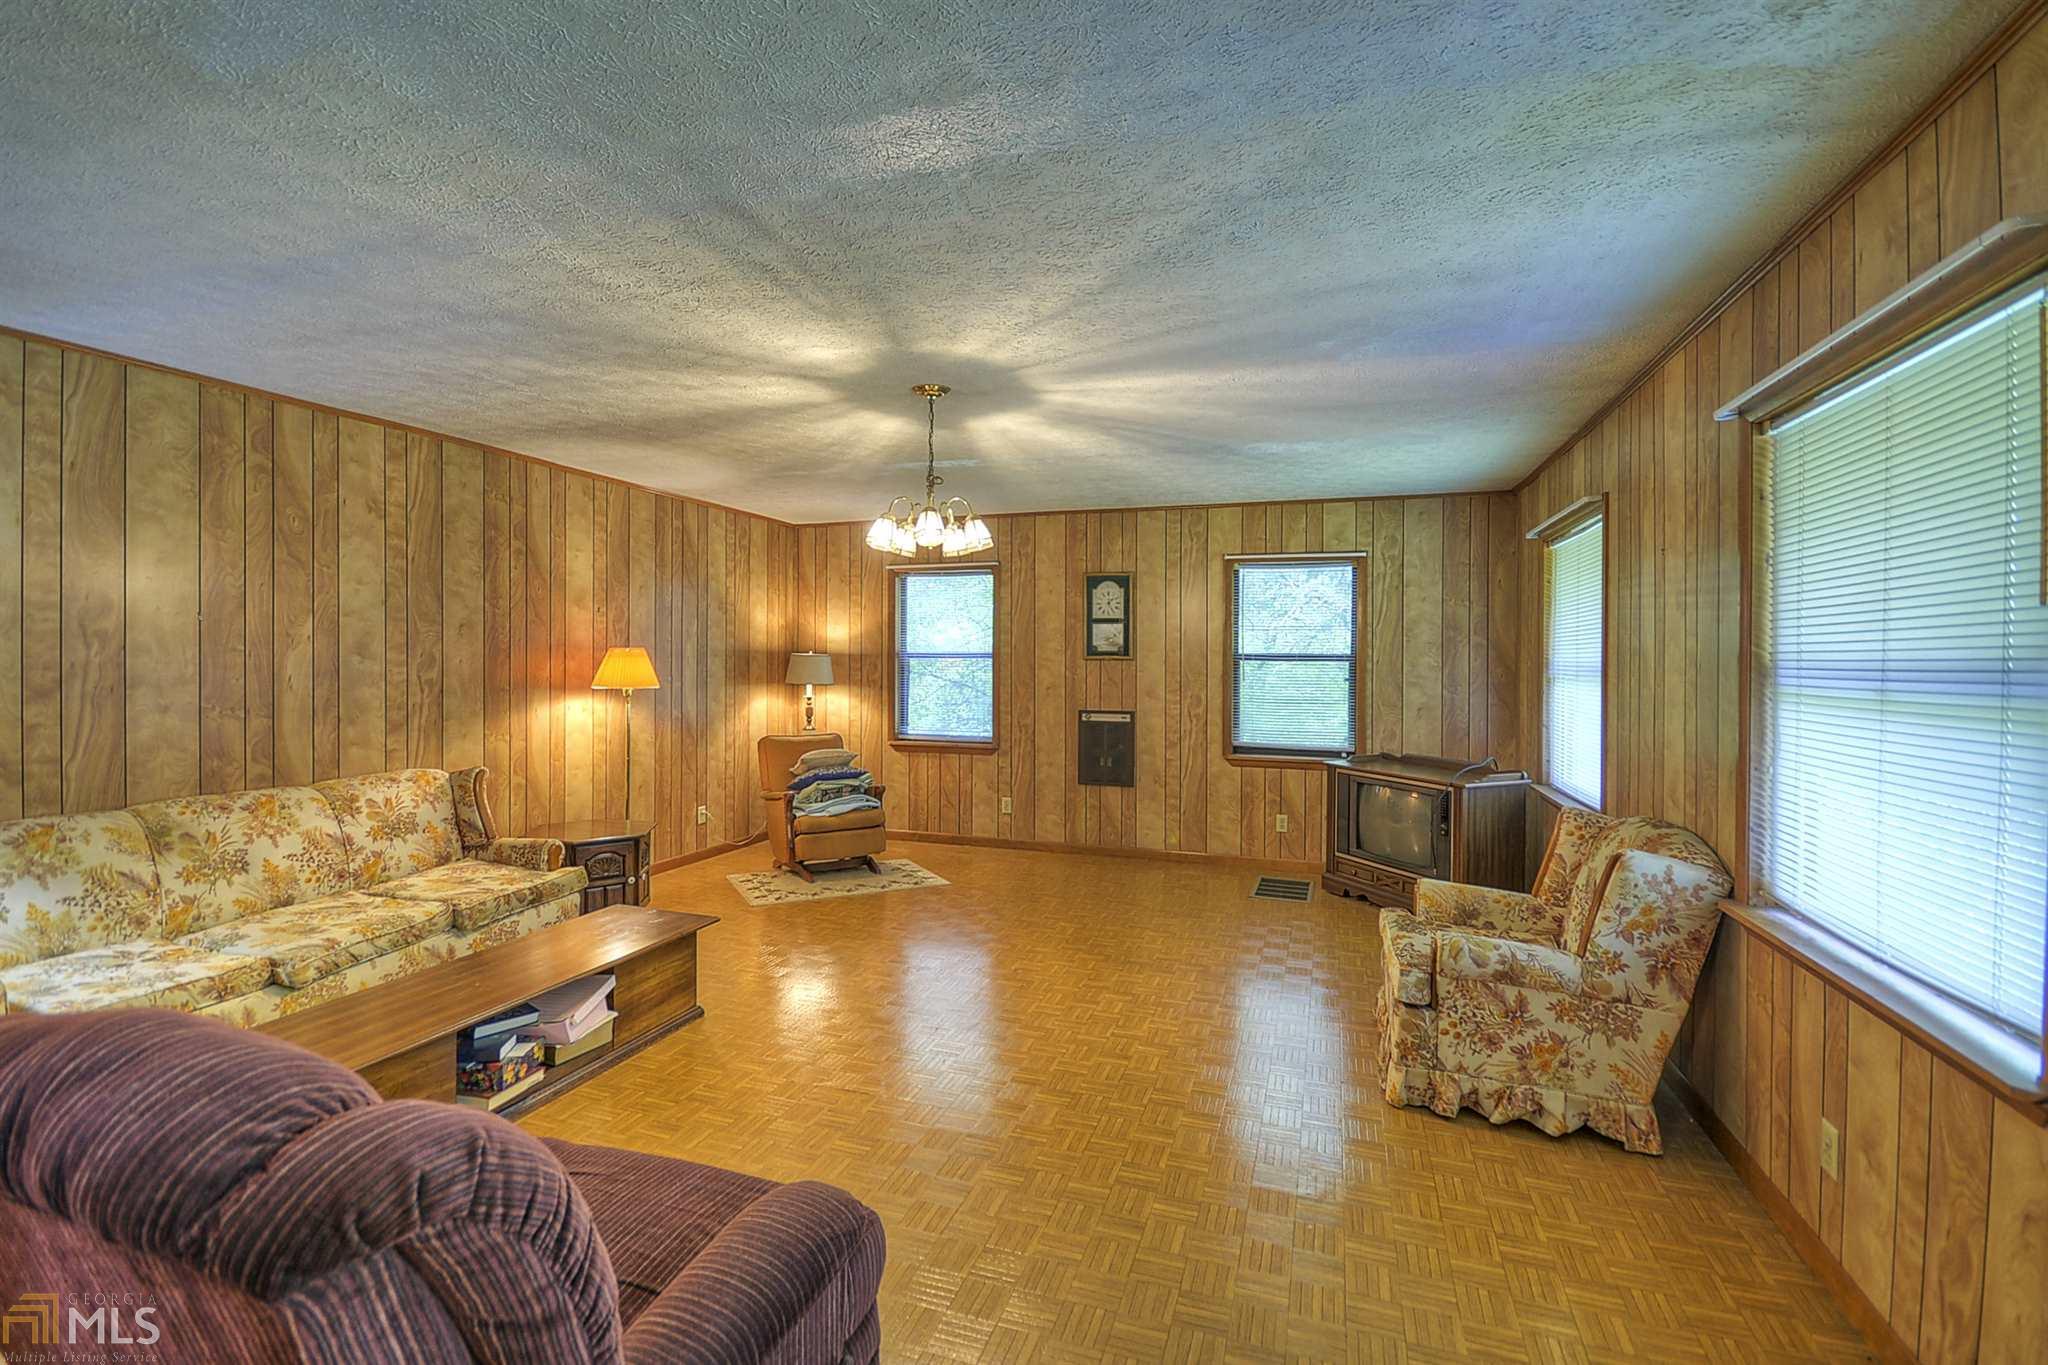 231 Bonnie Lane, Blairsville, GA 30512